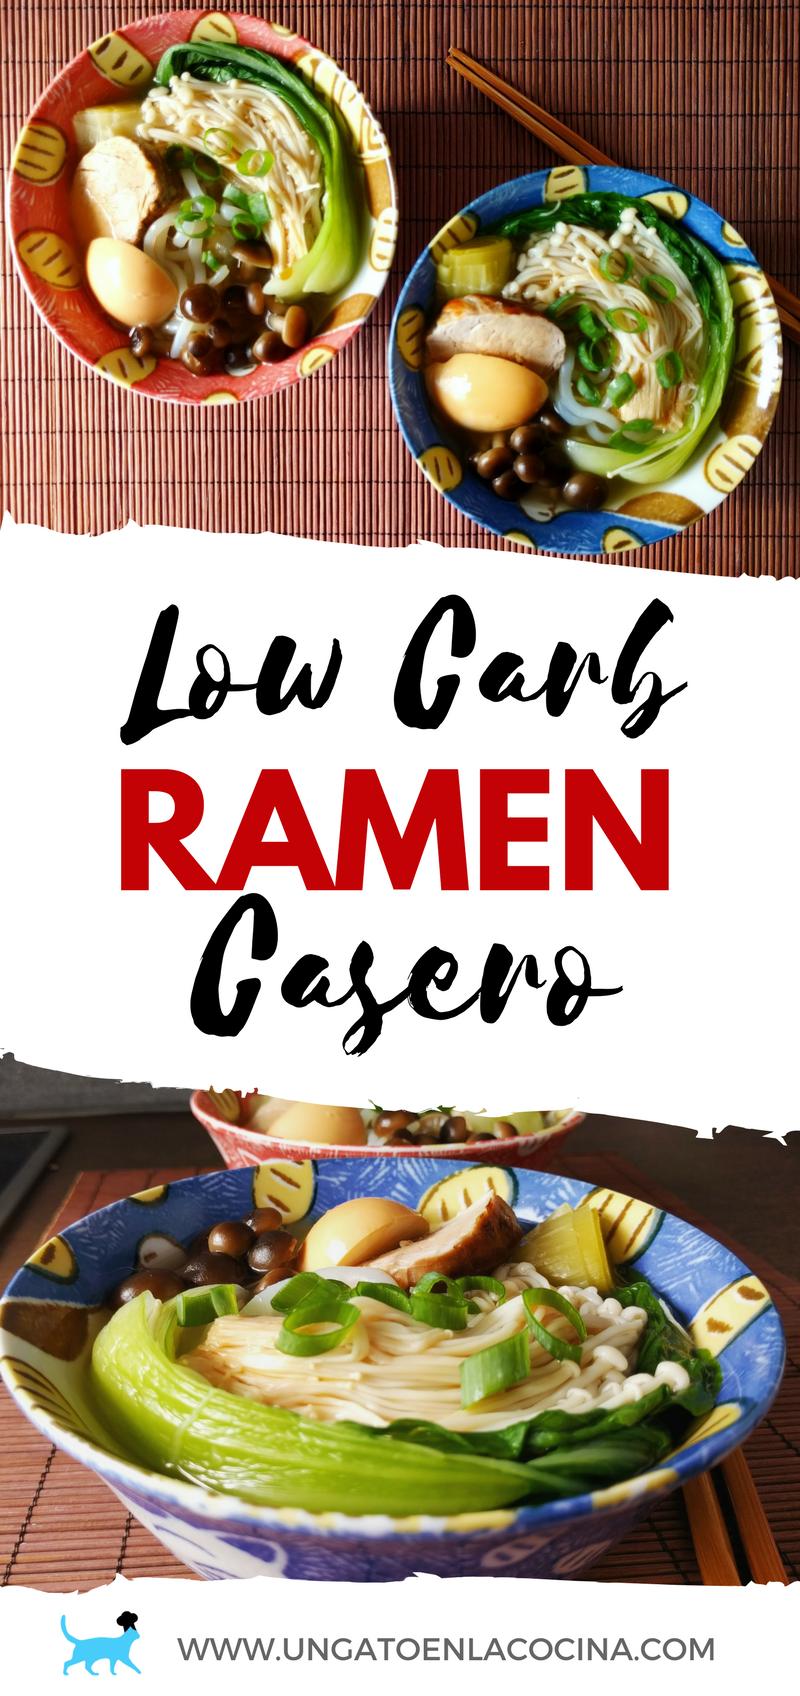 Low Carb Ramen Casero